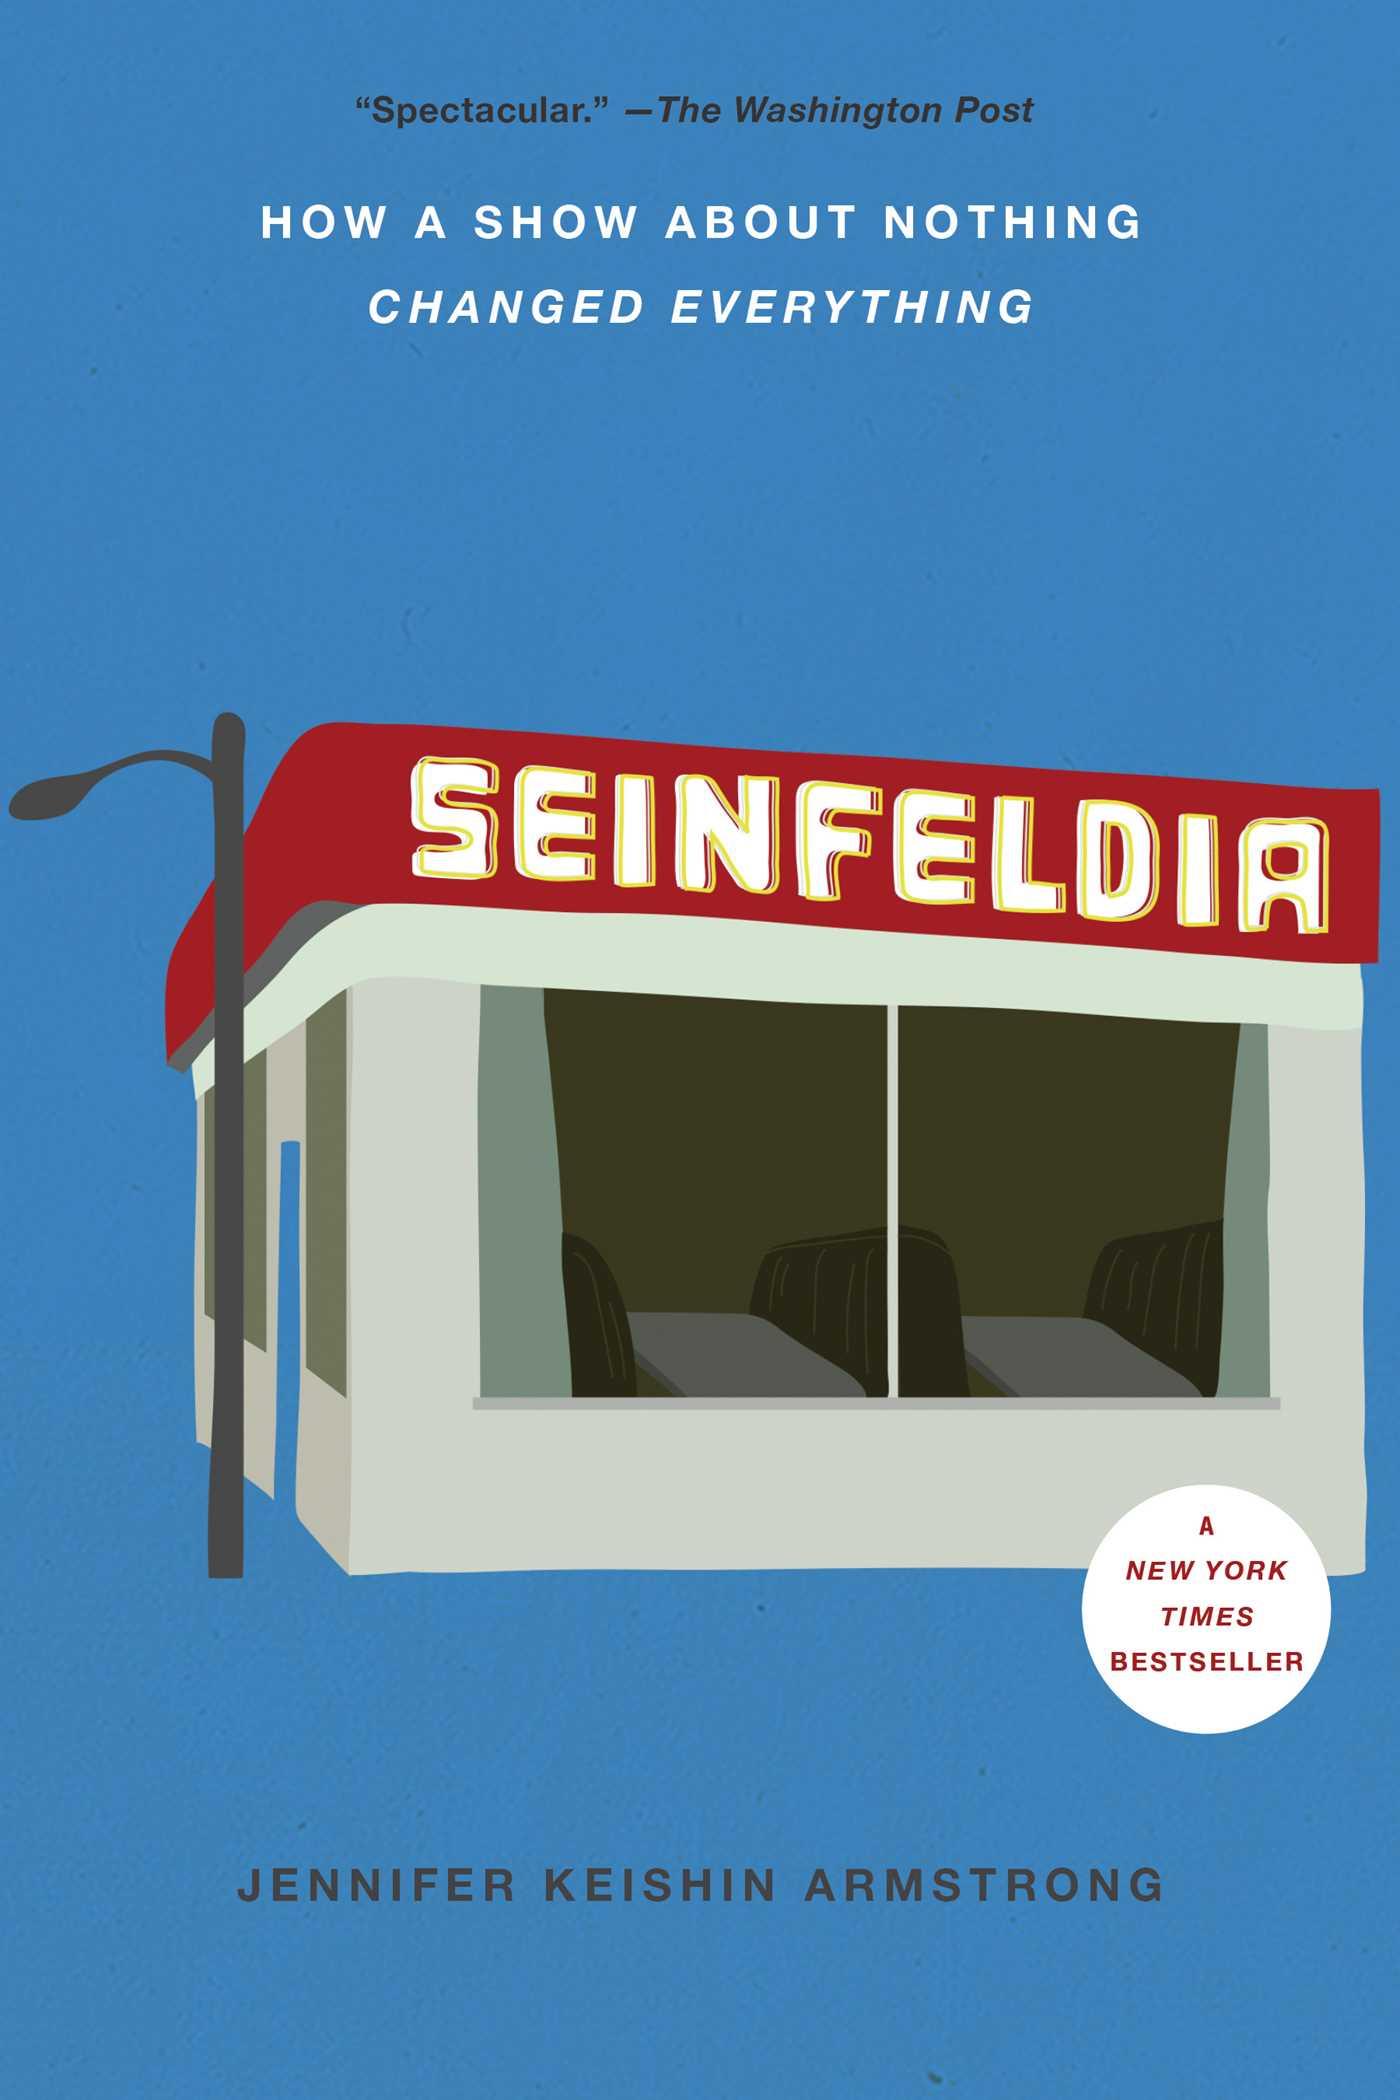 Seinfeldia 9781476756110 hr